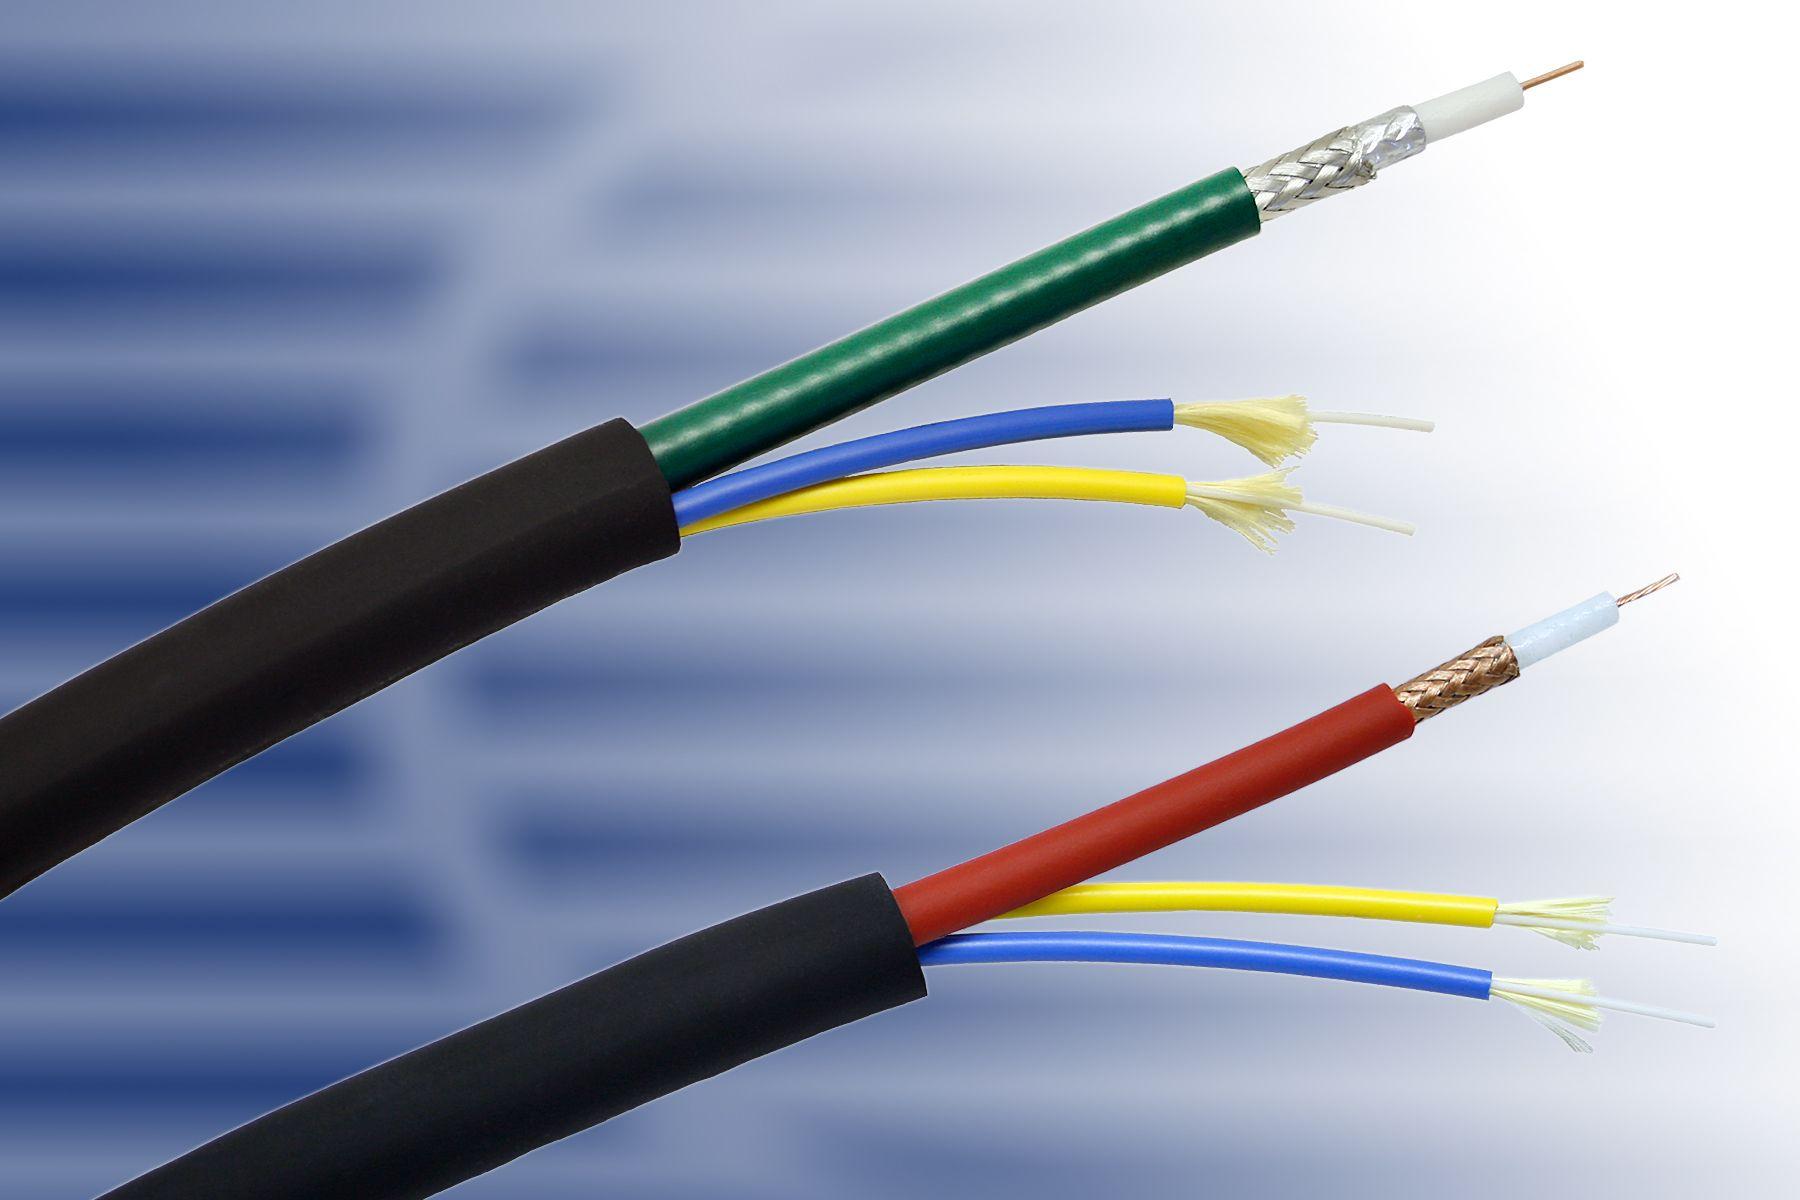 What Is Hybrid Fibre Coaxial Hfc Fiber Customized Windows Broadband